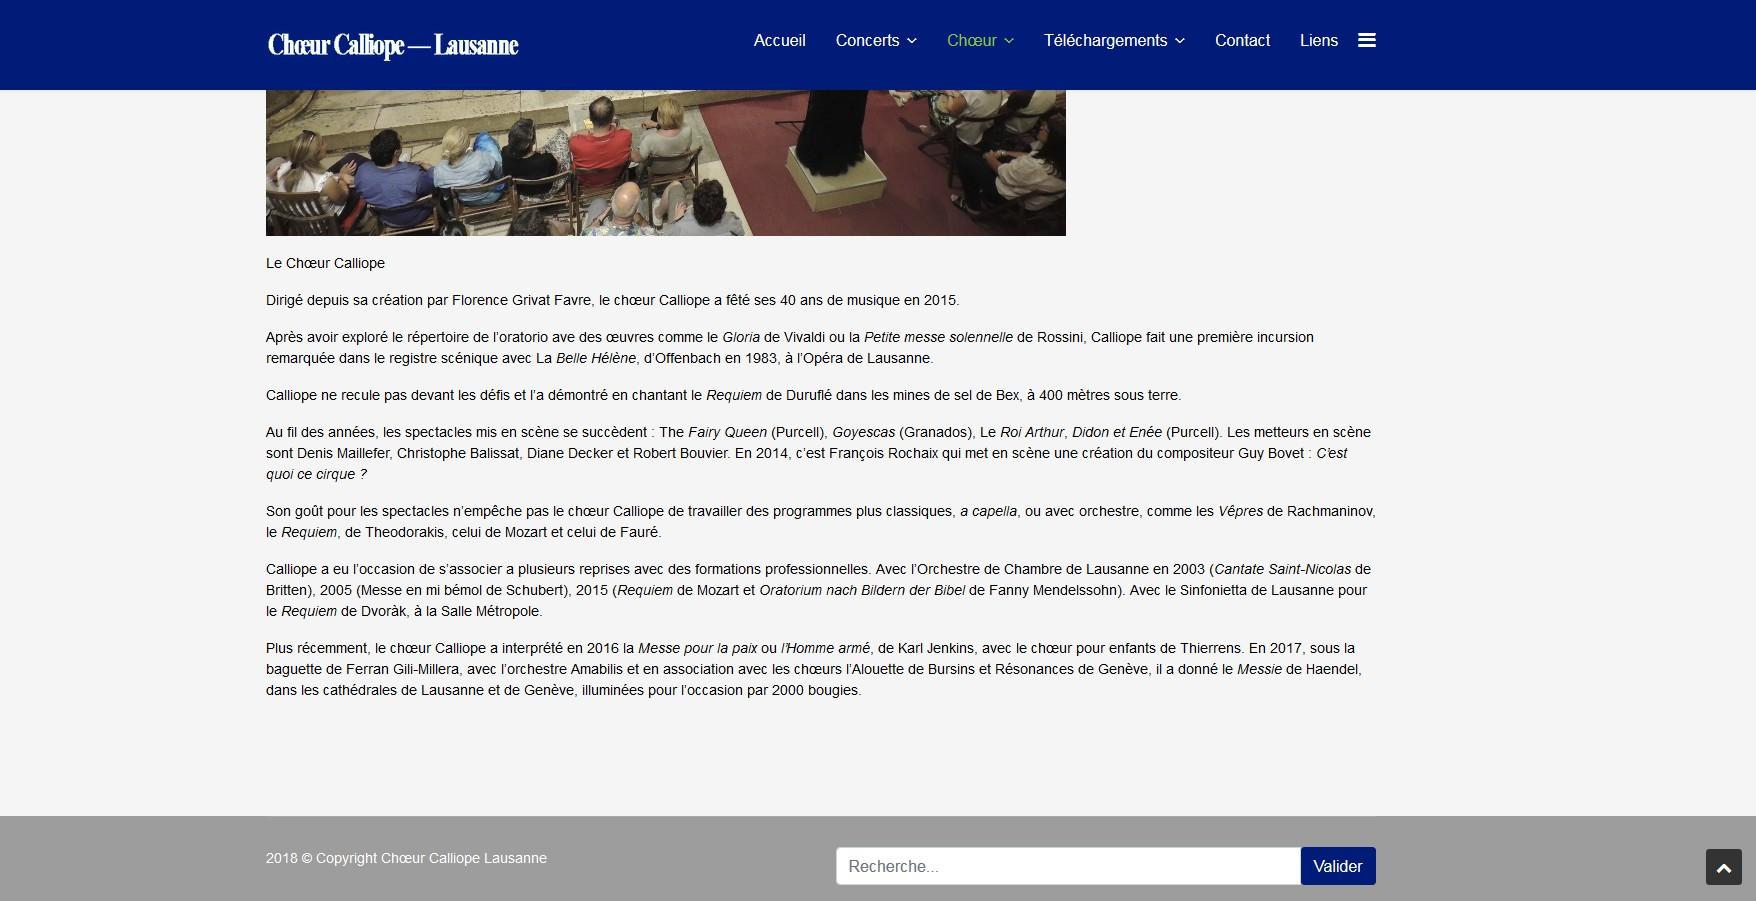 Edocman2-website.jpg